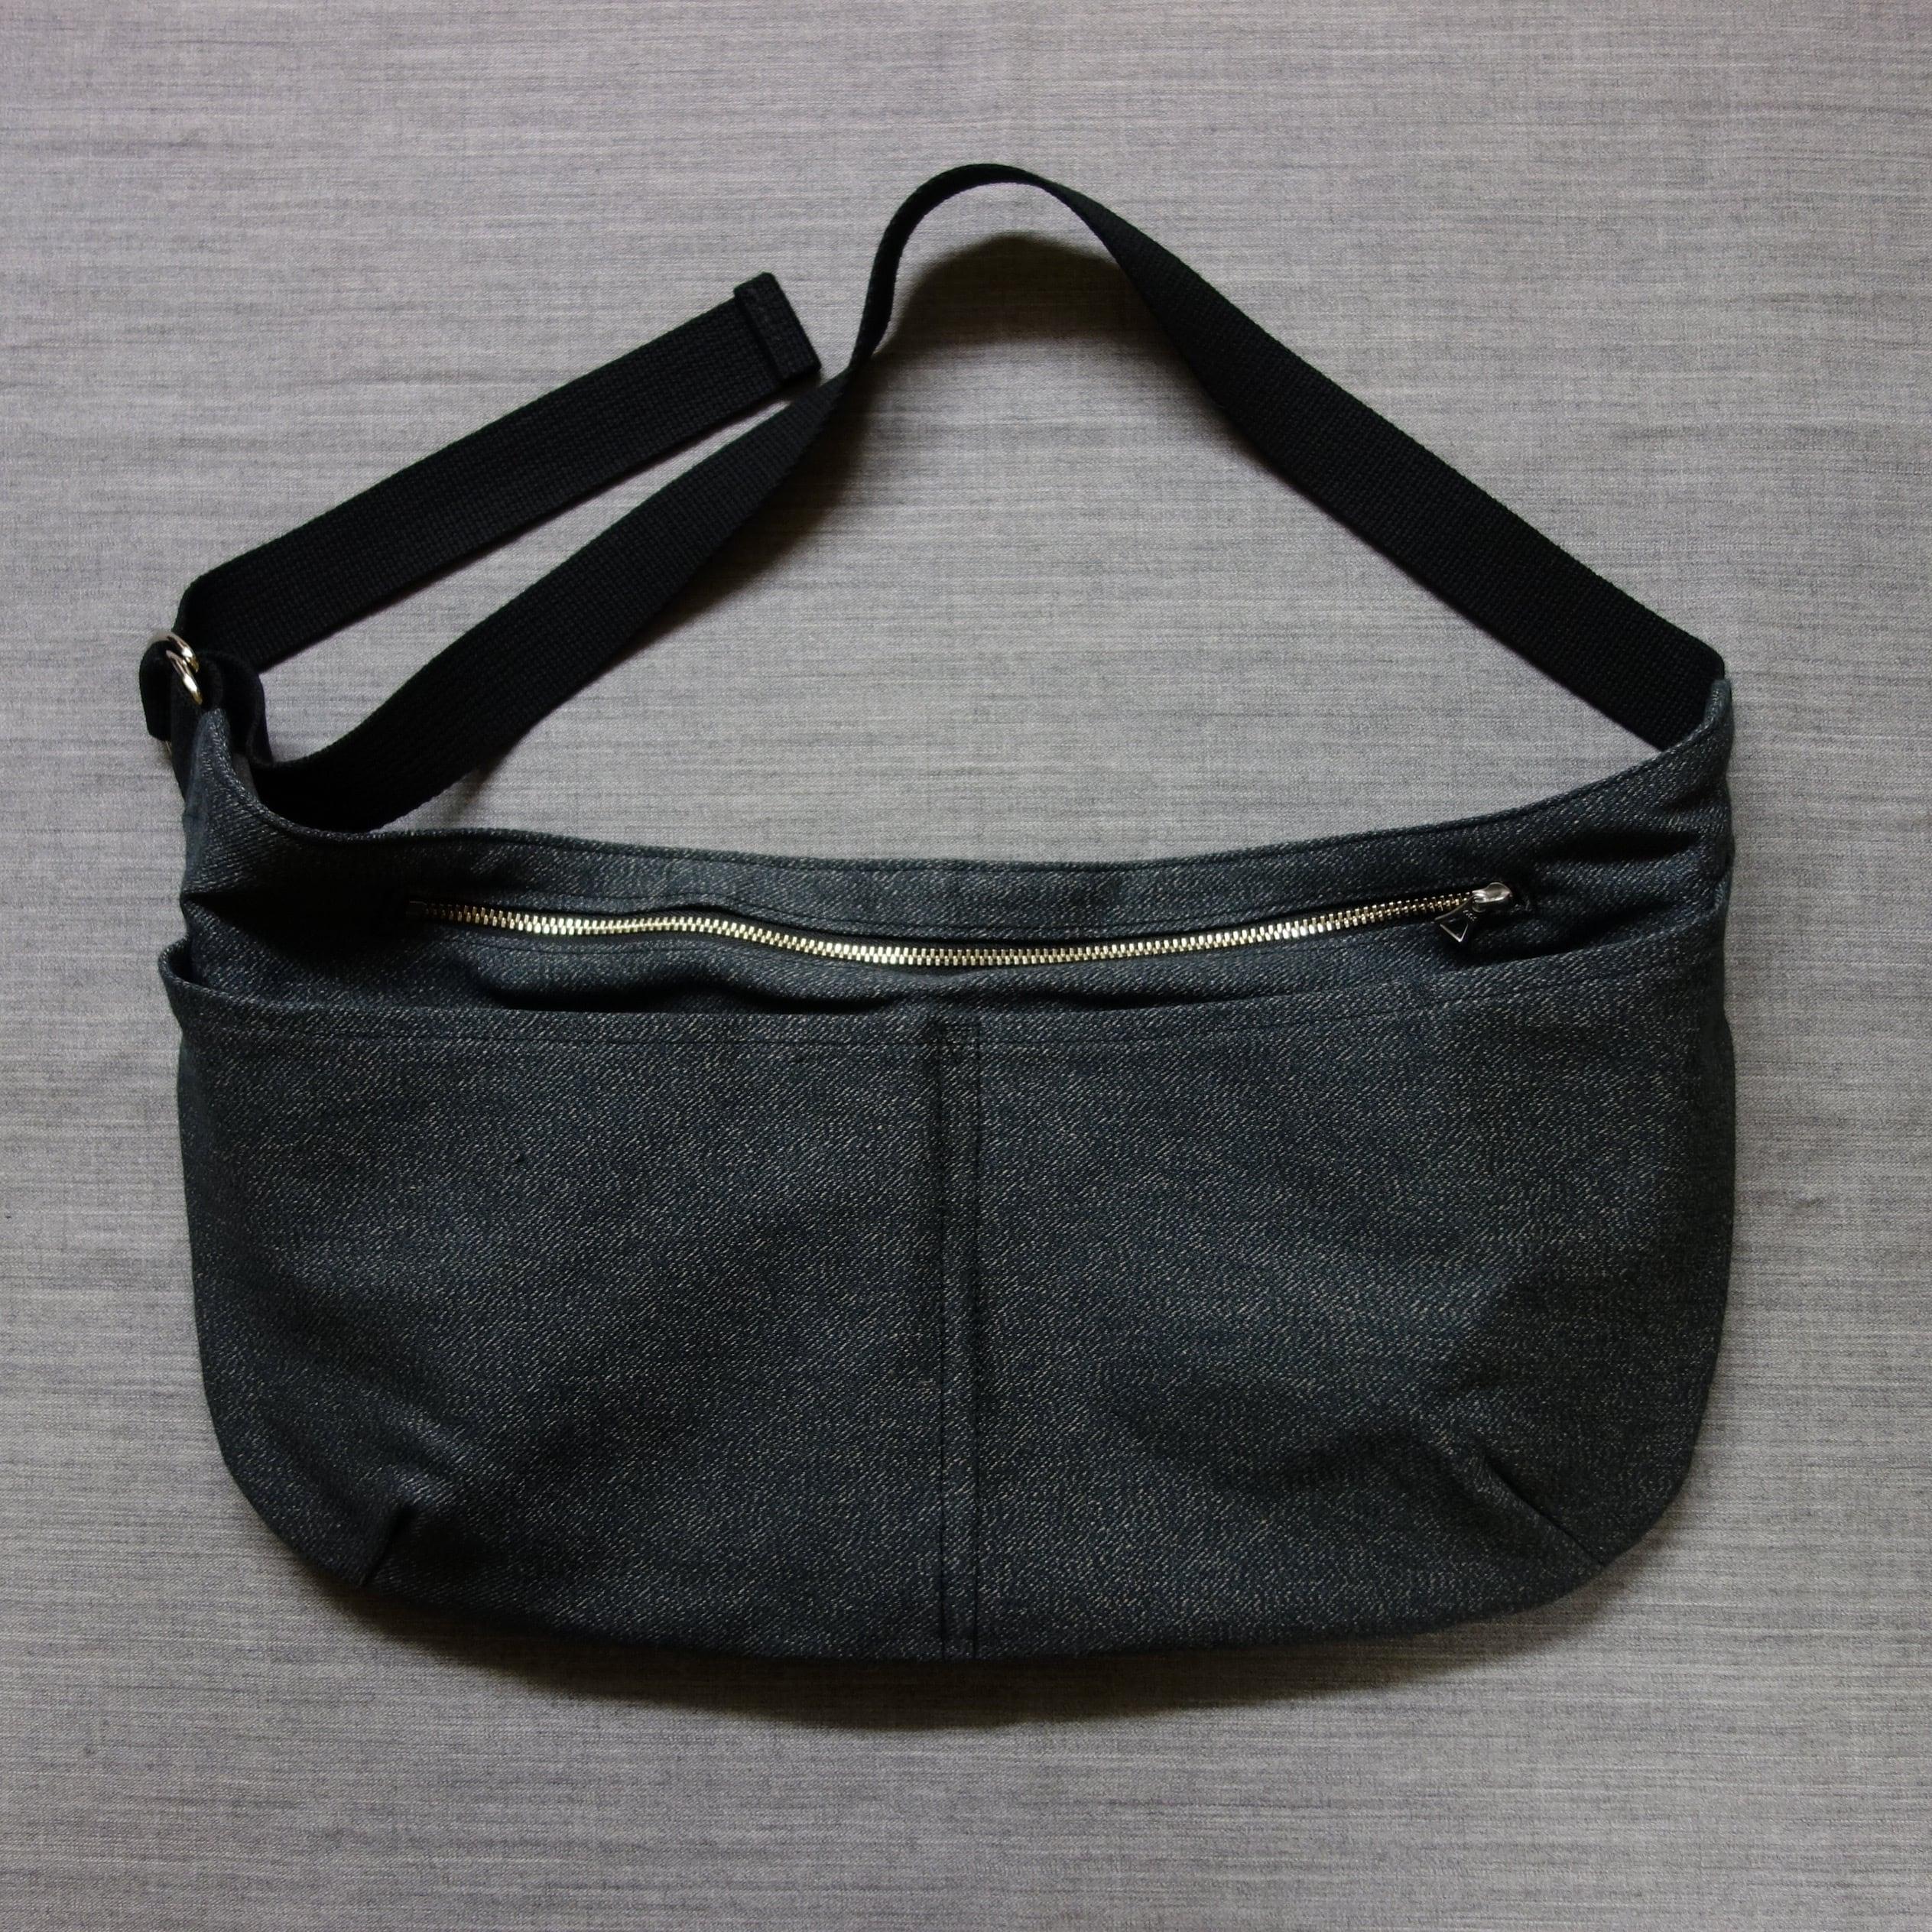 s/p apron bag